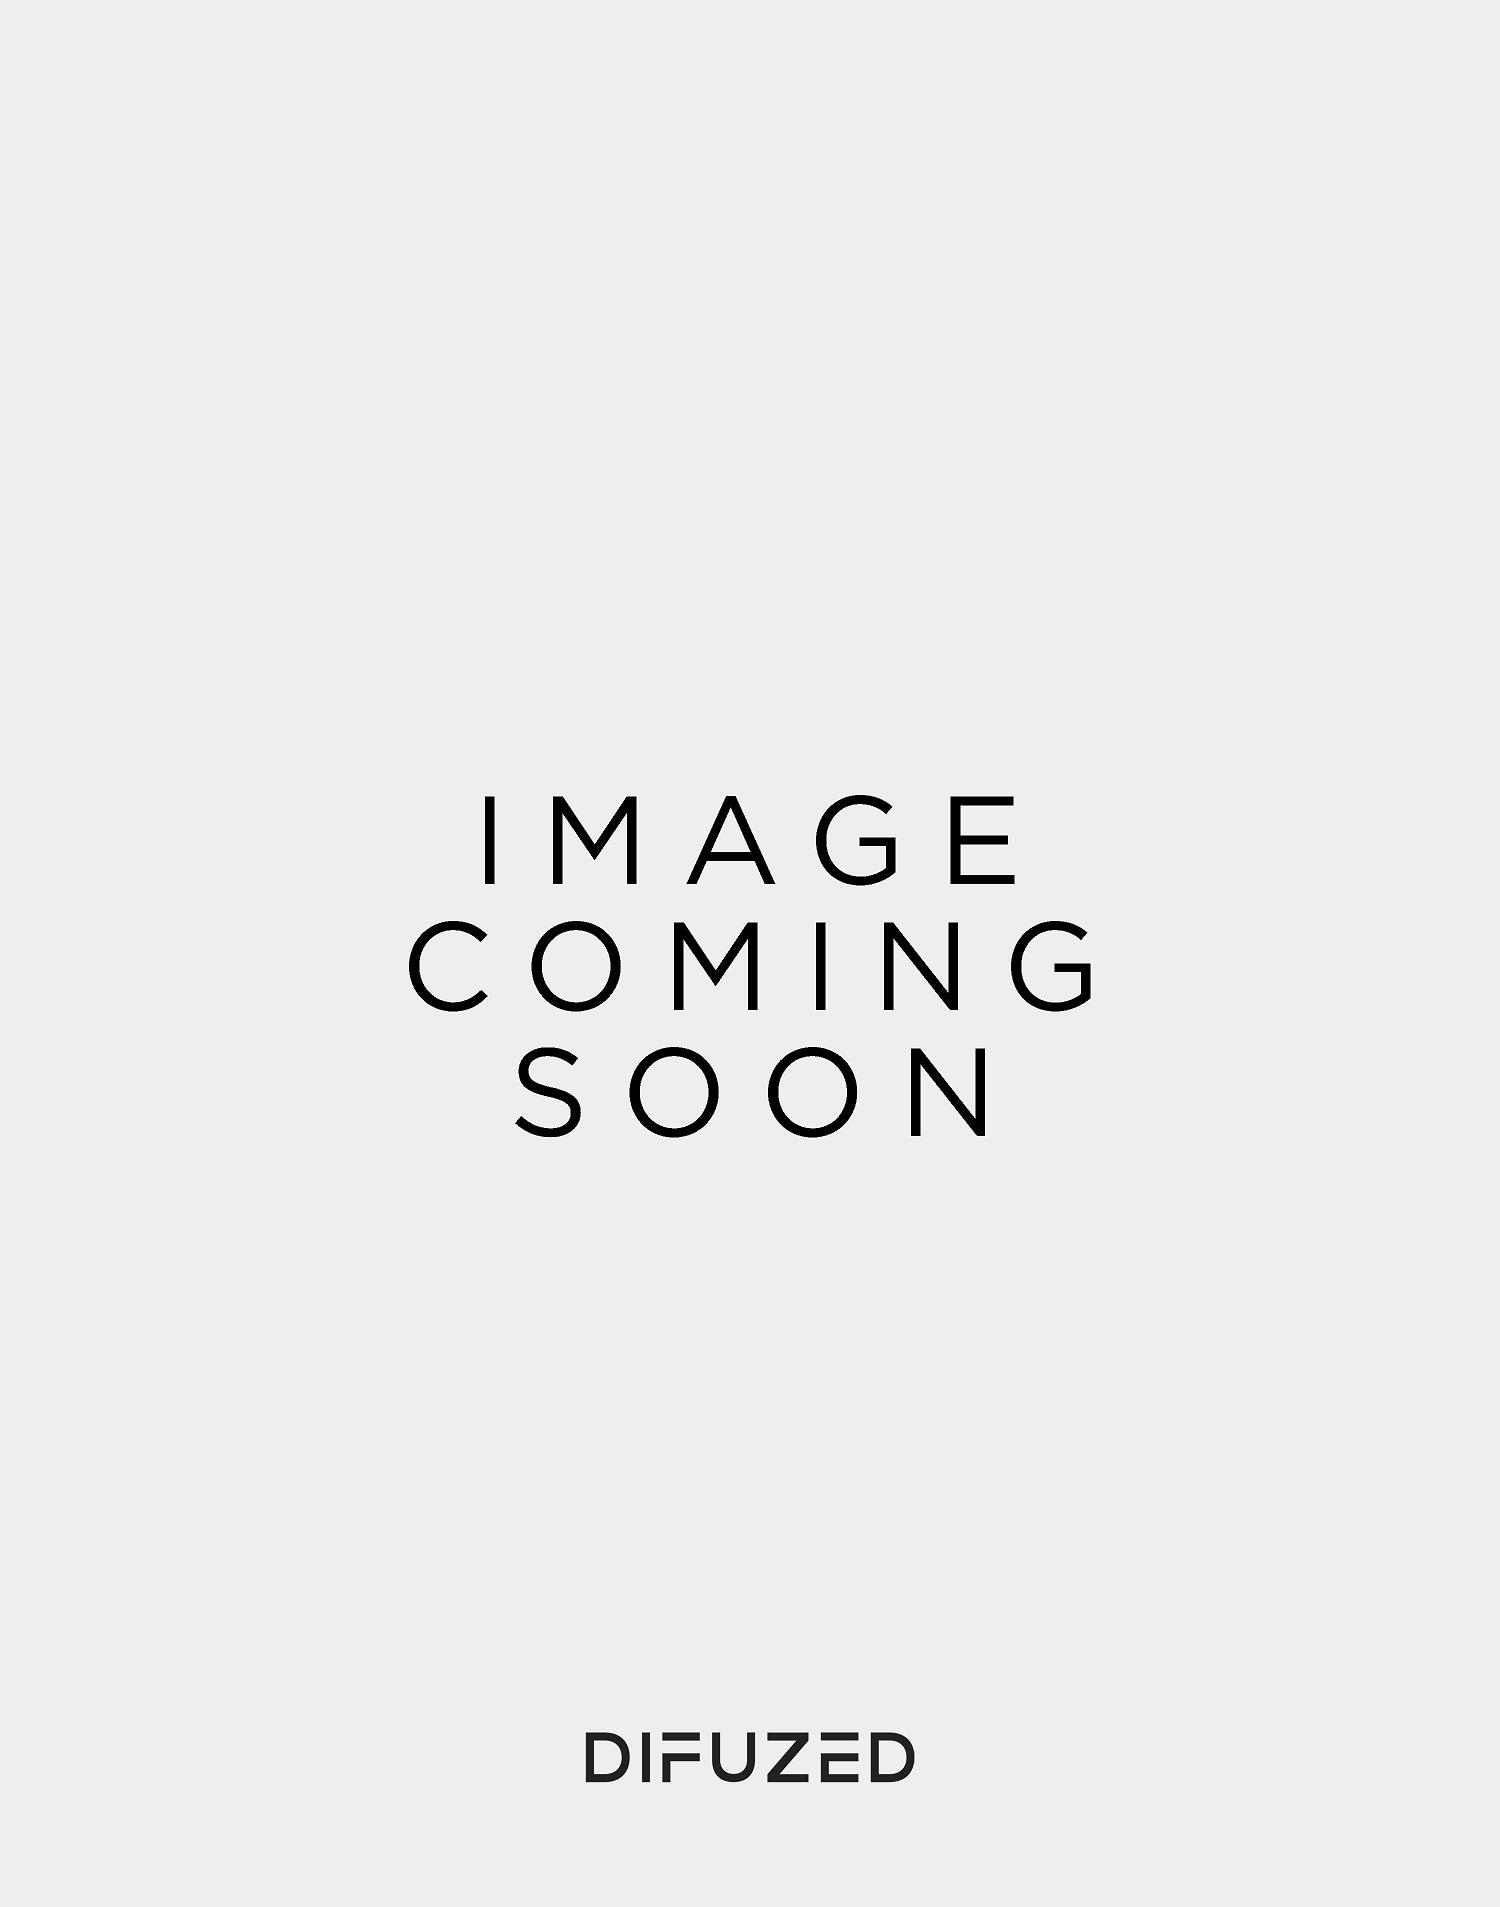 Unearth - Black bandana with white/gray print